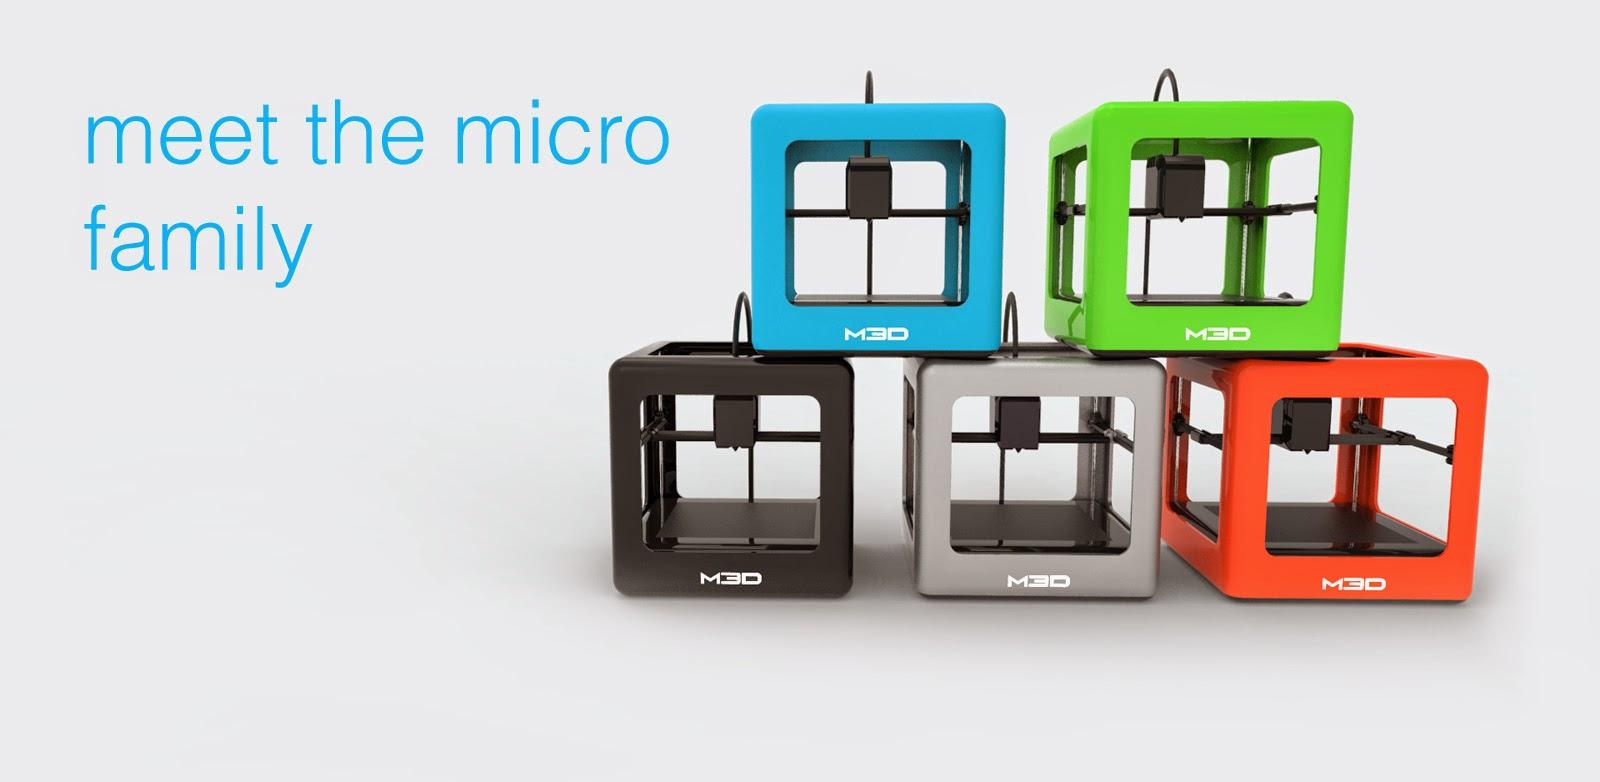 06-M3D-Michael-Armani-David-Jones-Micro-3D-Printer-www-designstack-co